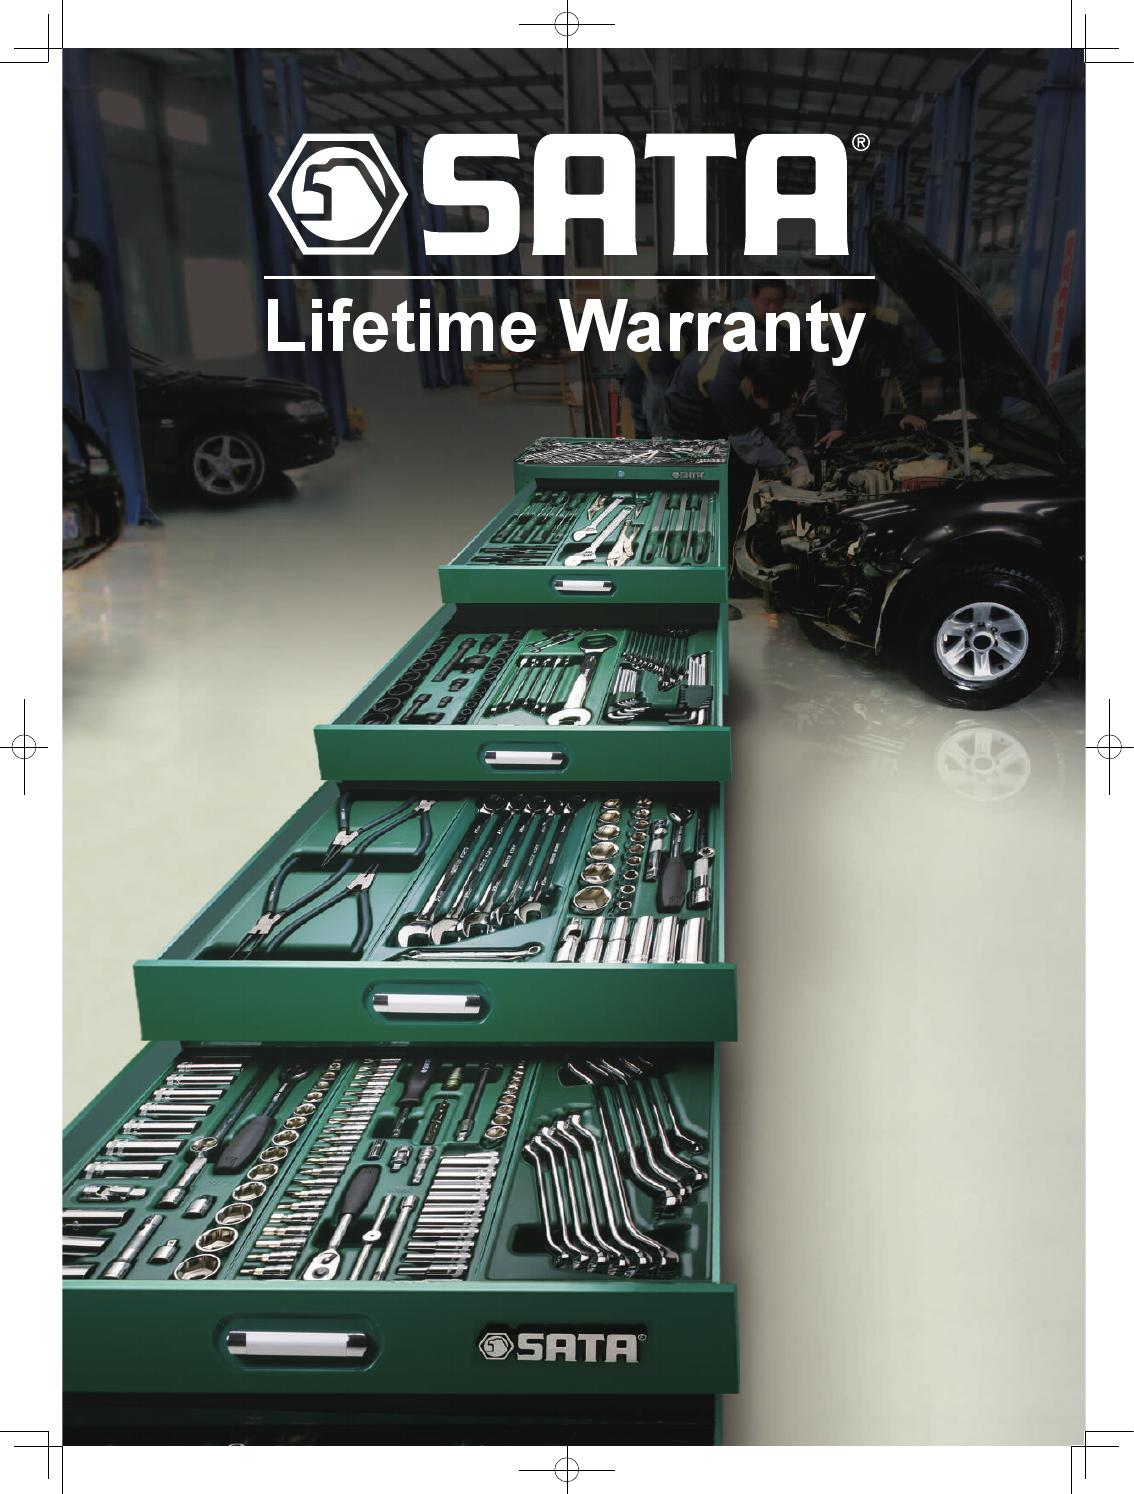 3.5MM SATA Tool 6 Point 1//4 Dr.6pt Socket Metric Driver Standard Hand Tools